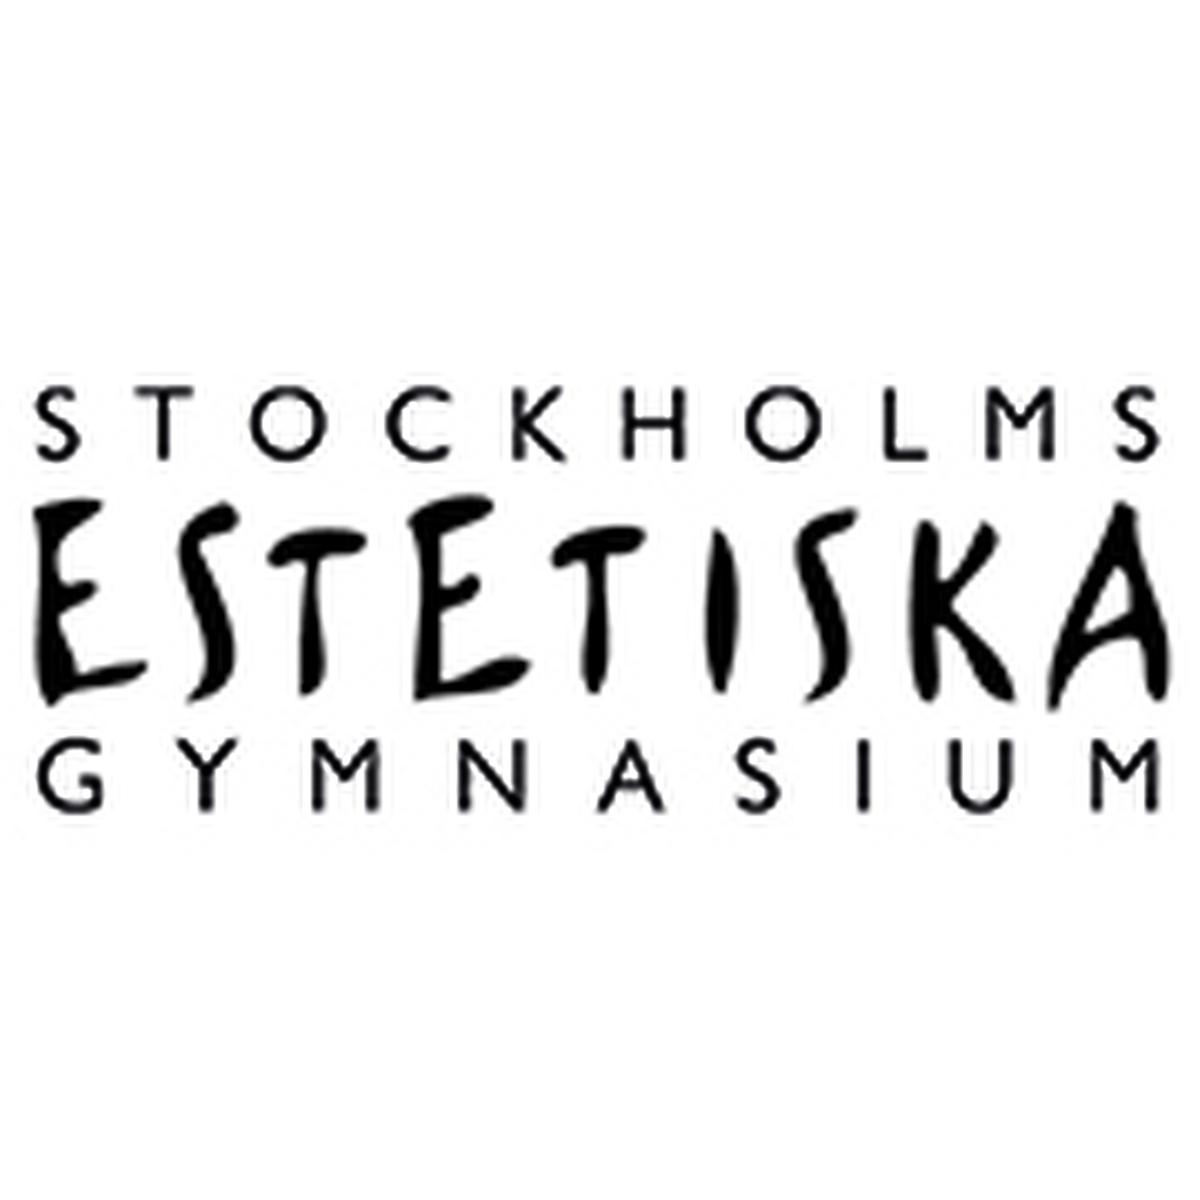 Stockholms Estetiska Gymnasium